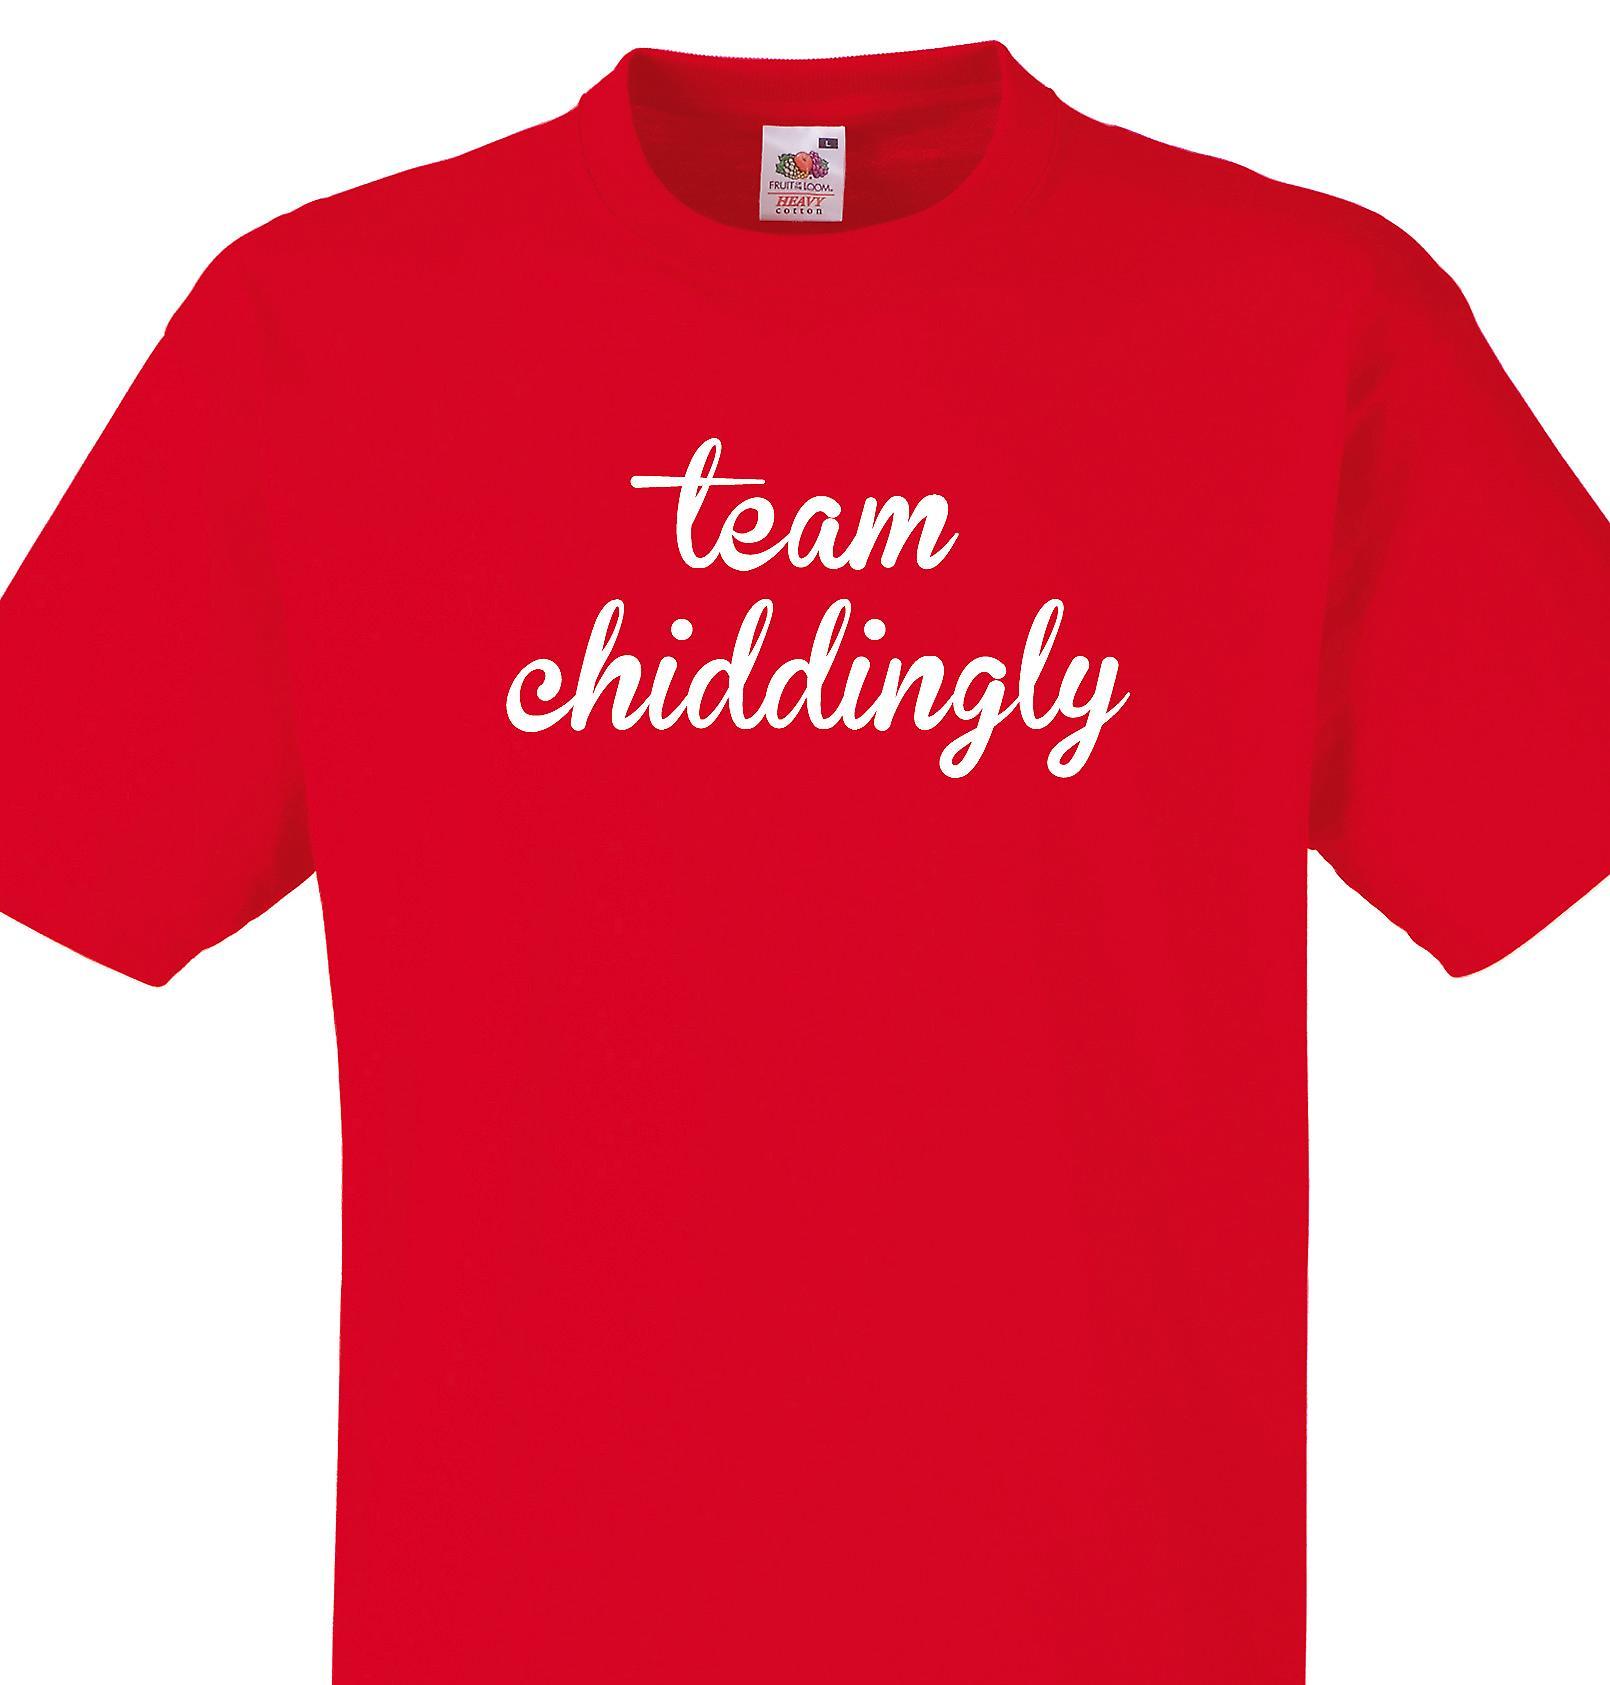 Team Chiddingly Red T shirt